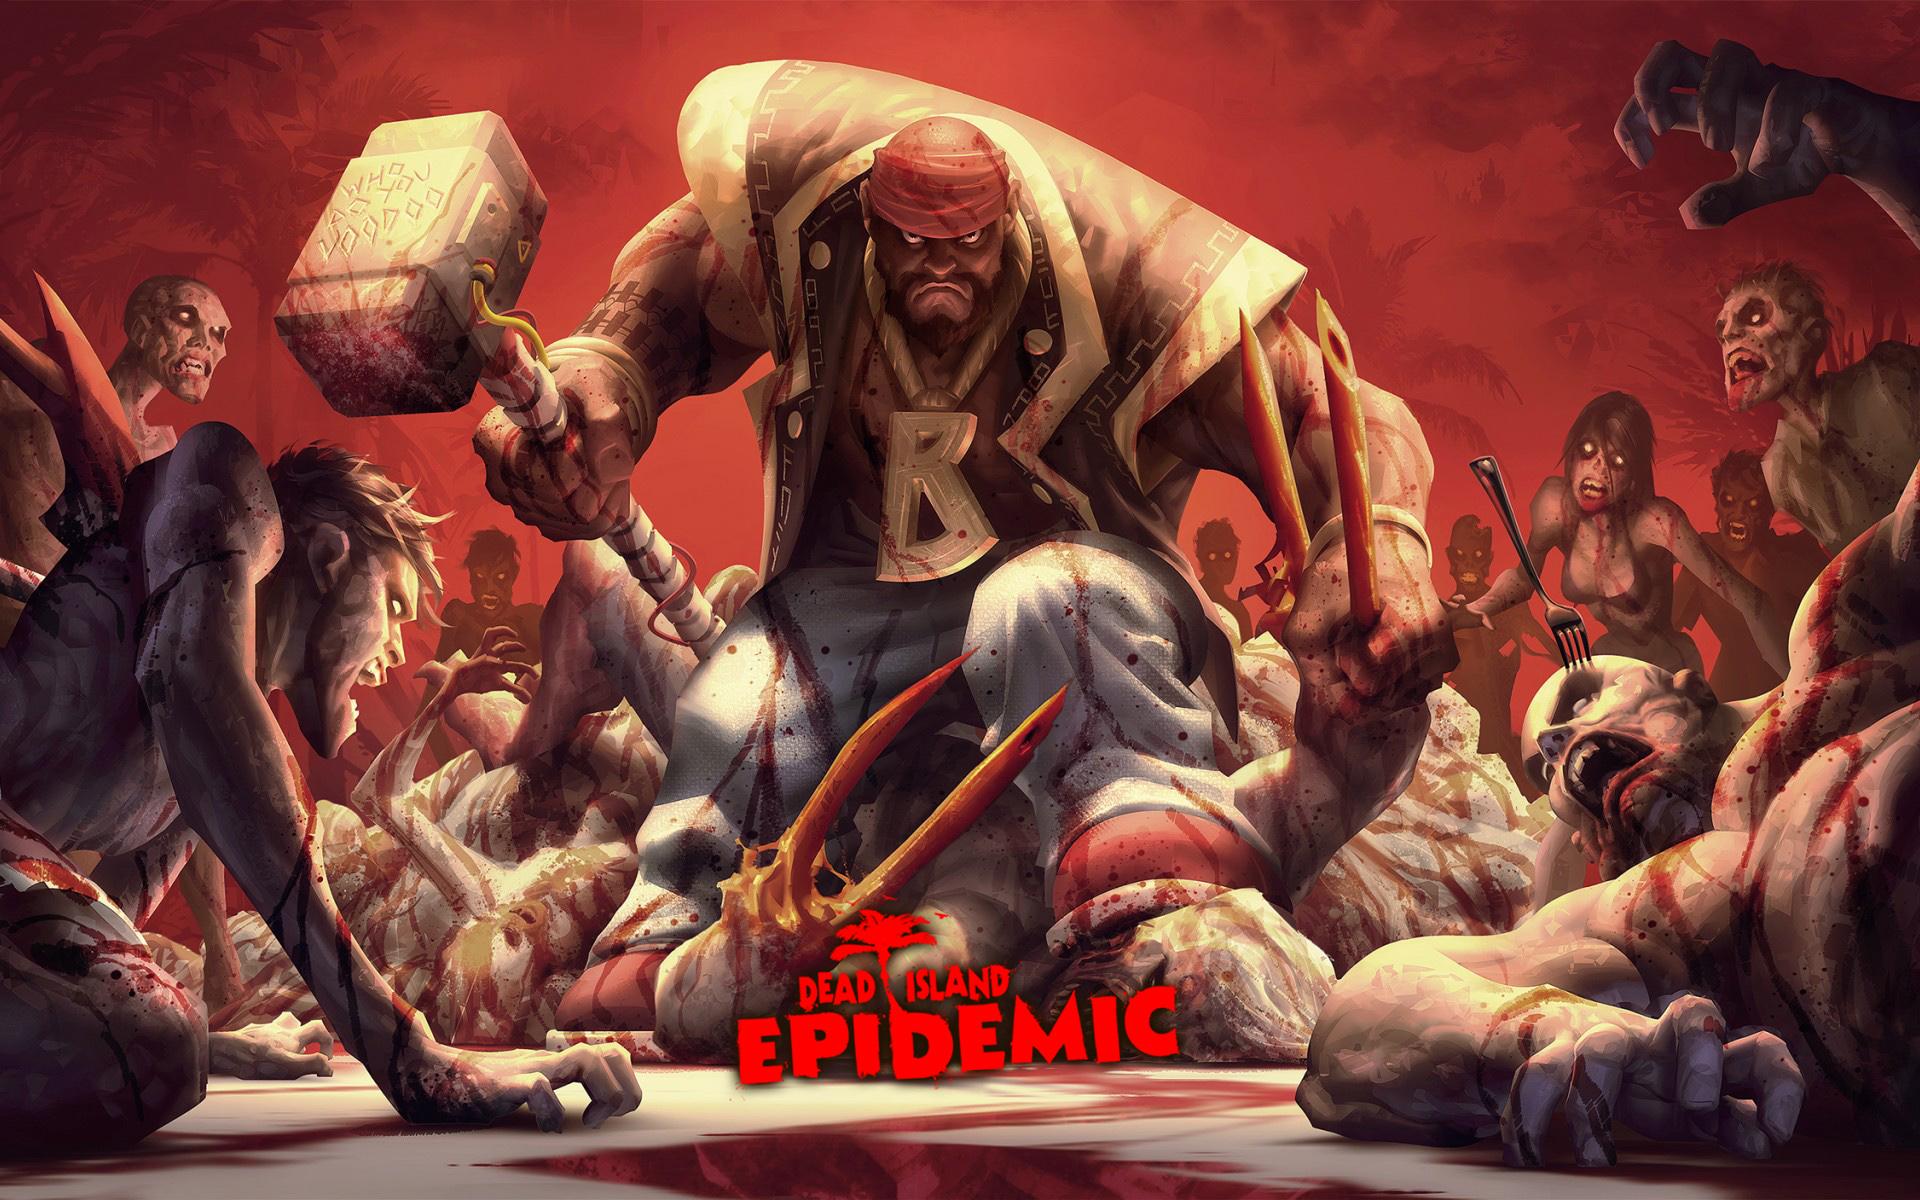 HD Wallpapers Dead Isl Epidemic